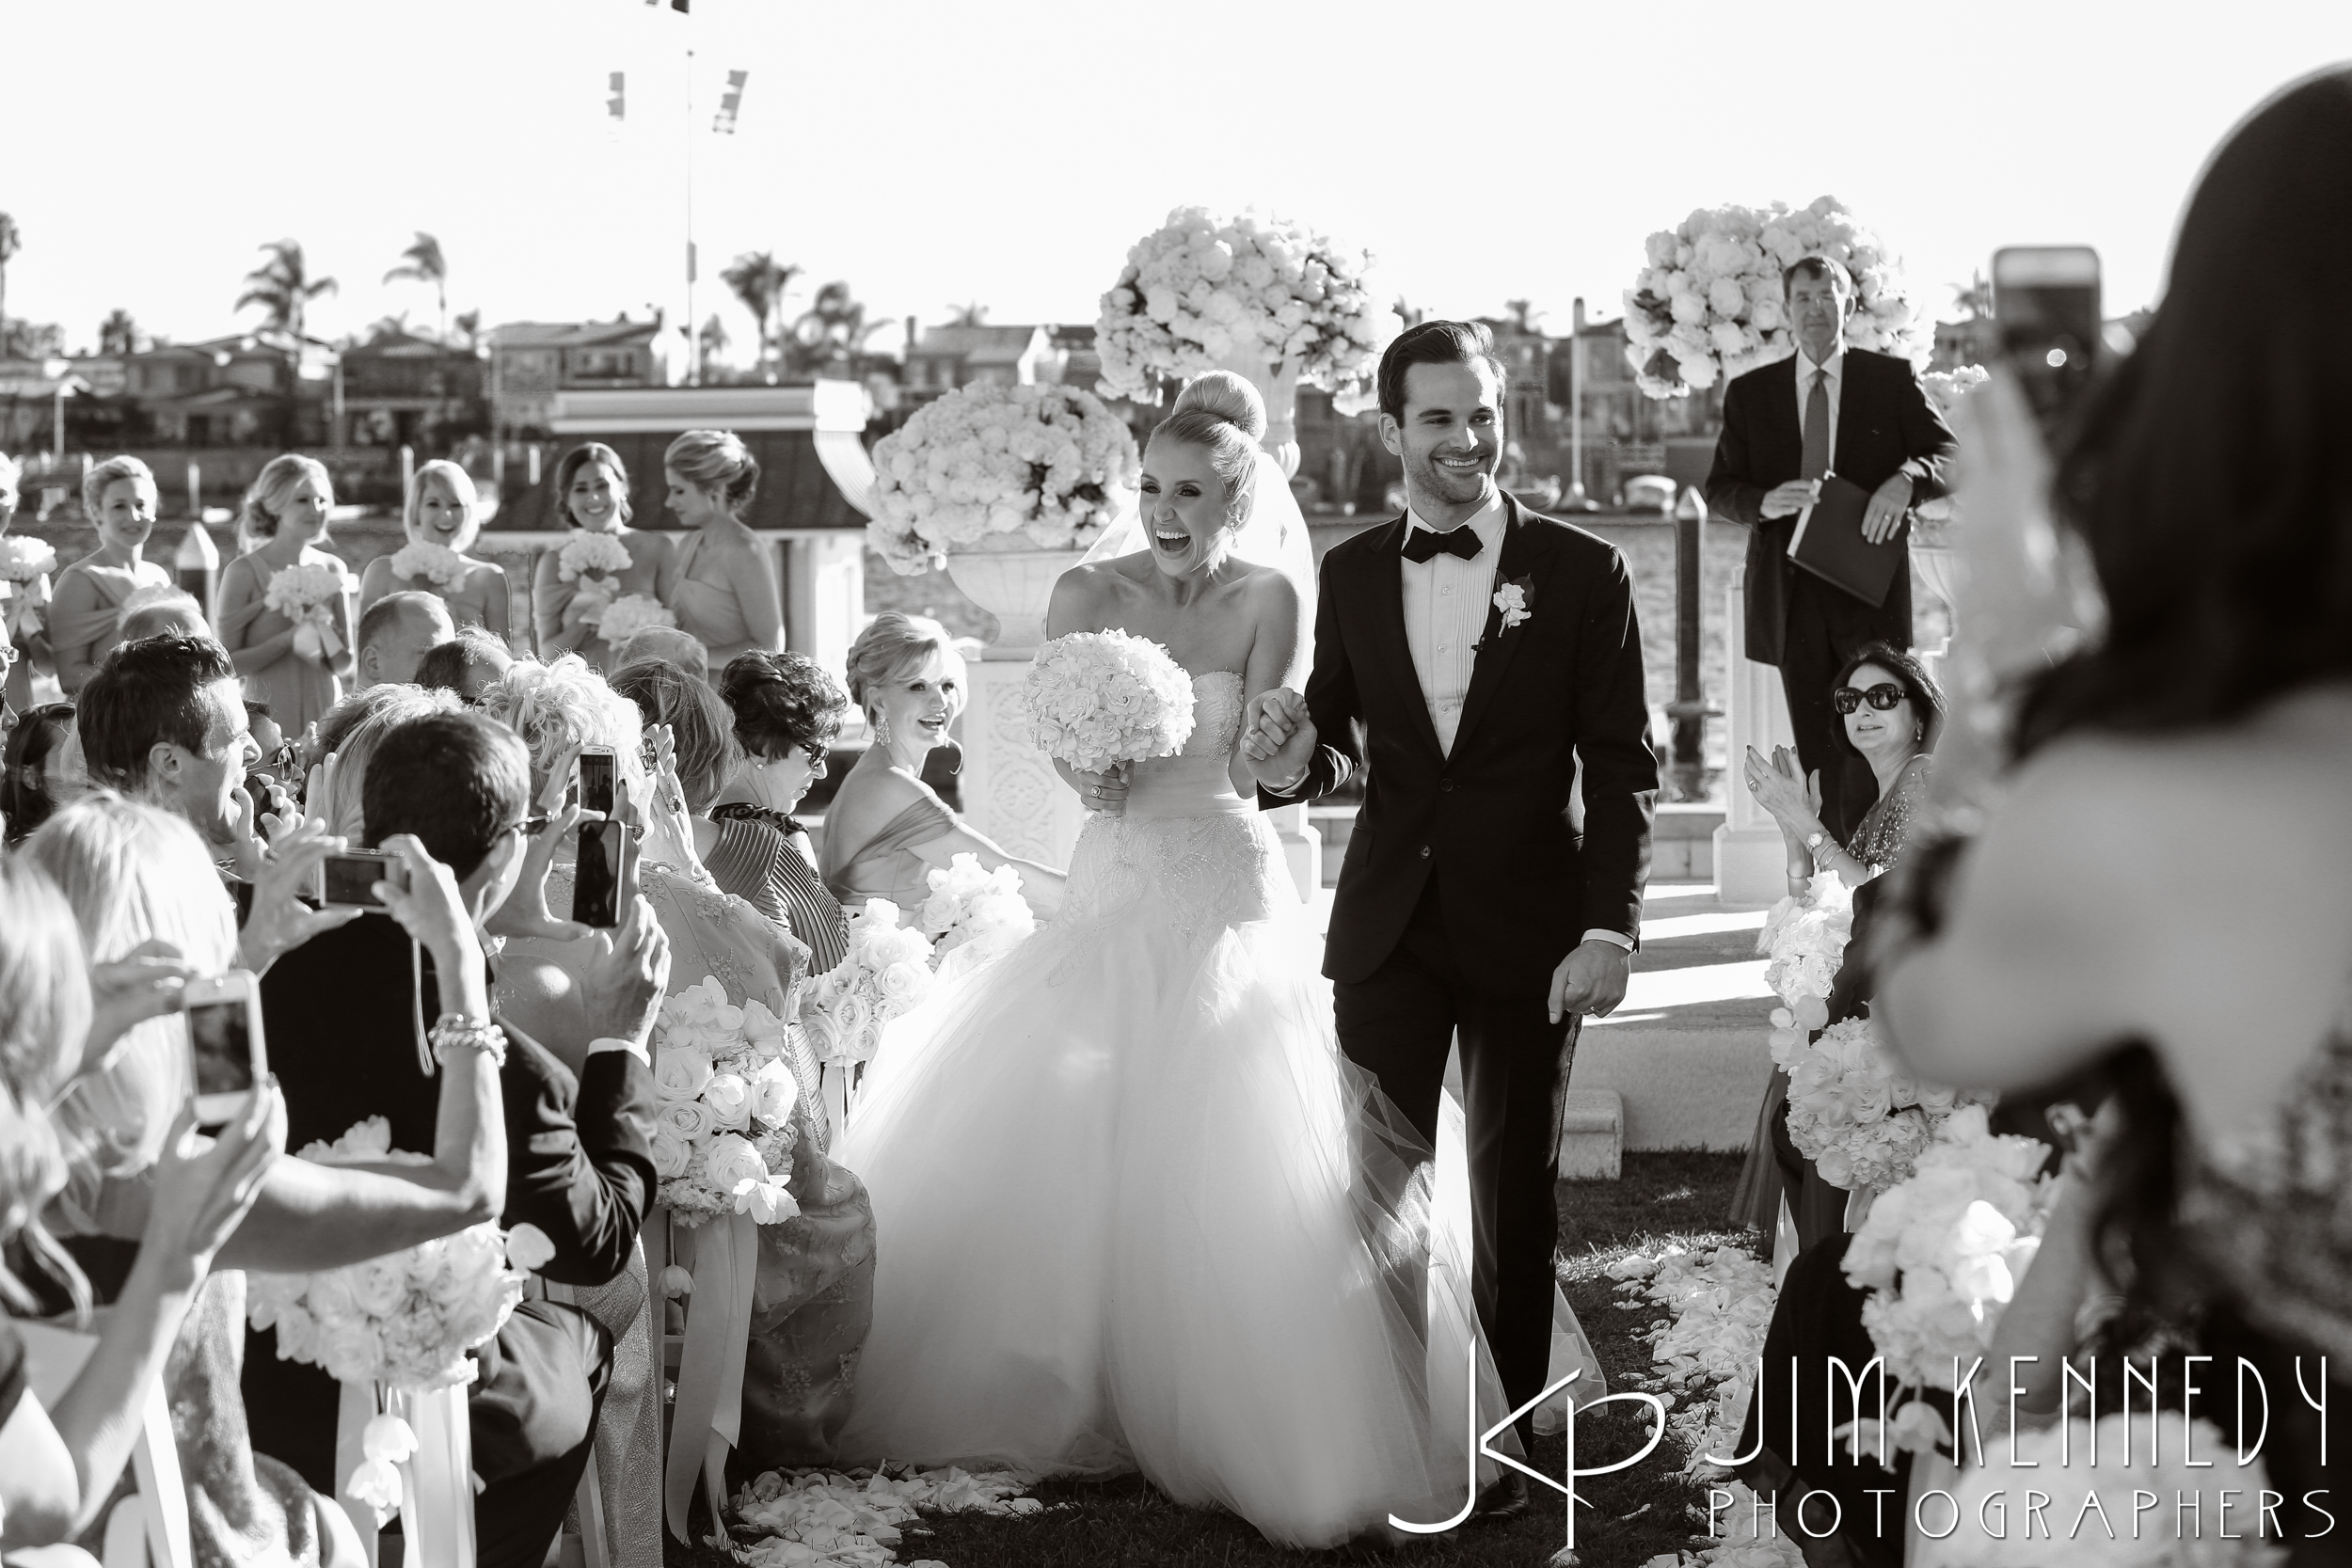 balboa-bay-resort-wedding-photography_0111.JPG